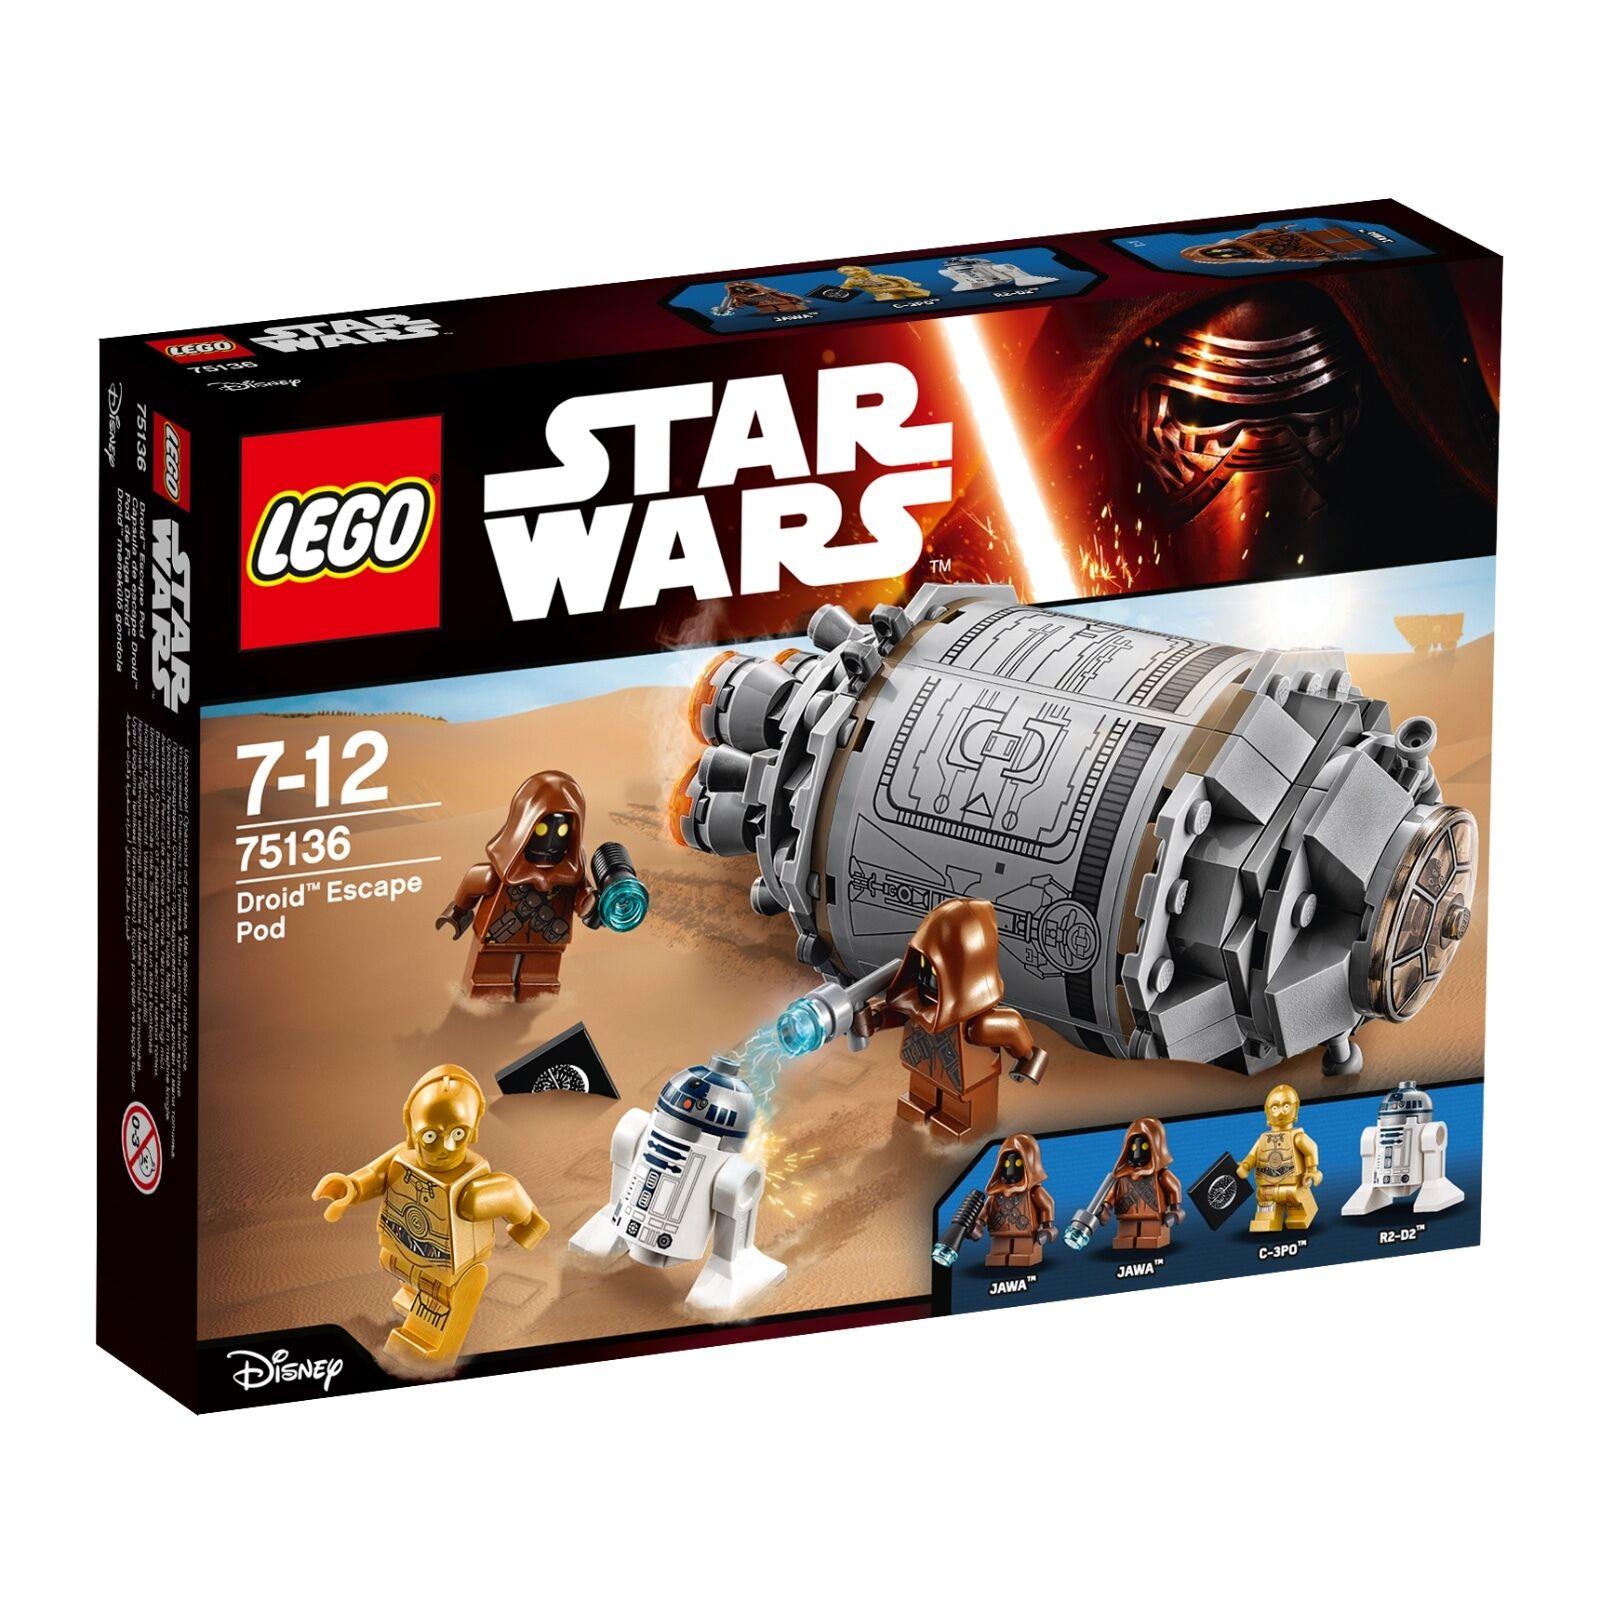 LEGO® Star Wars™ 75136 Droid™ Escape Pod NEU OVP NEW MISB NRFB